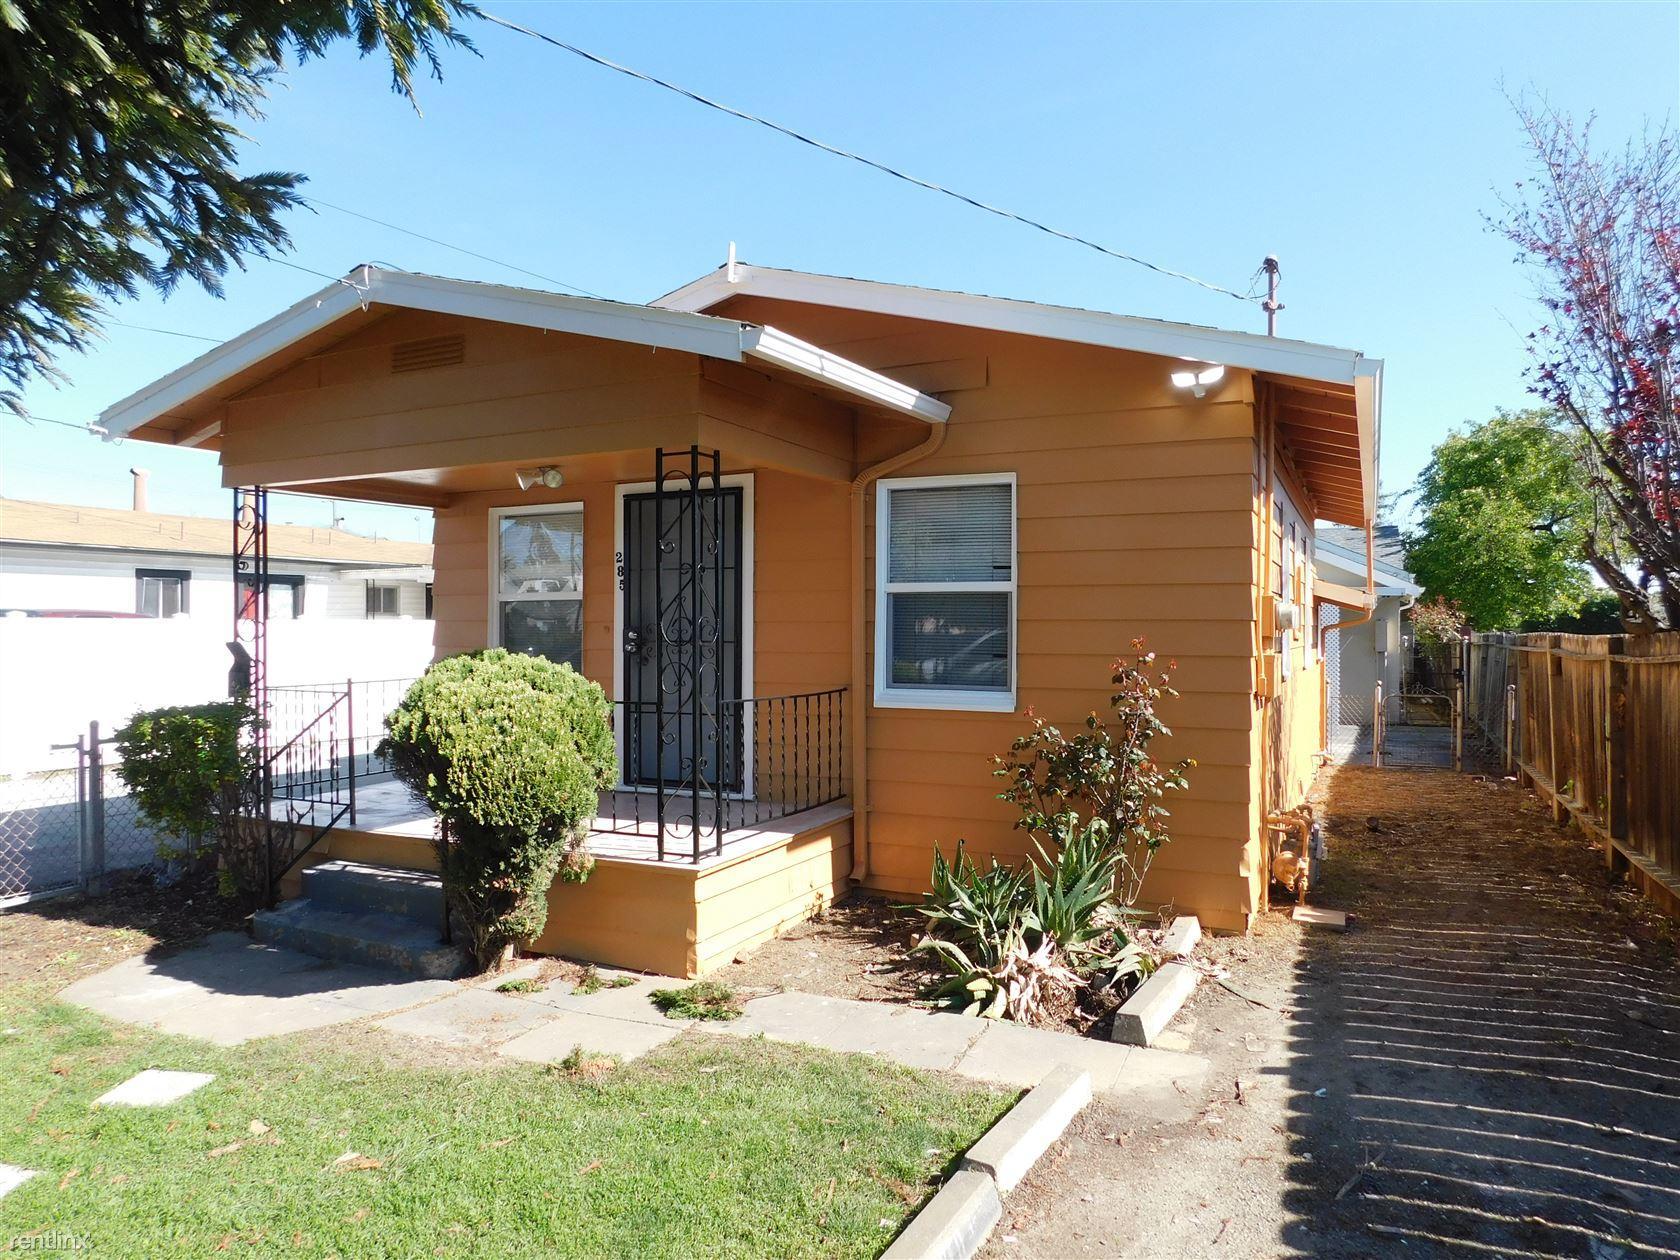 285 Sunset Blvd, Hayward, CA 94541 For Rent | Trulia